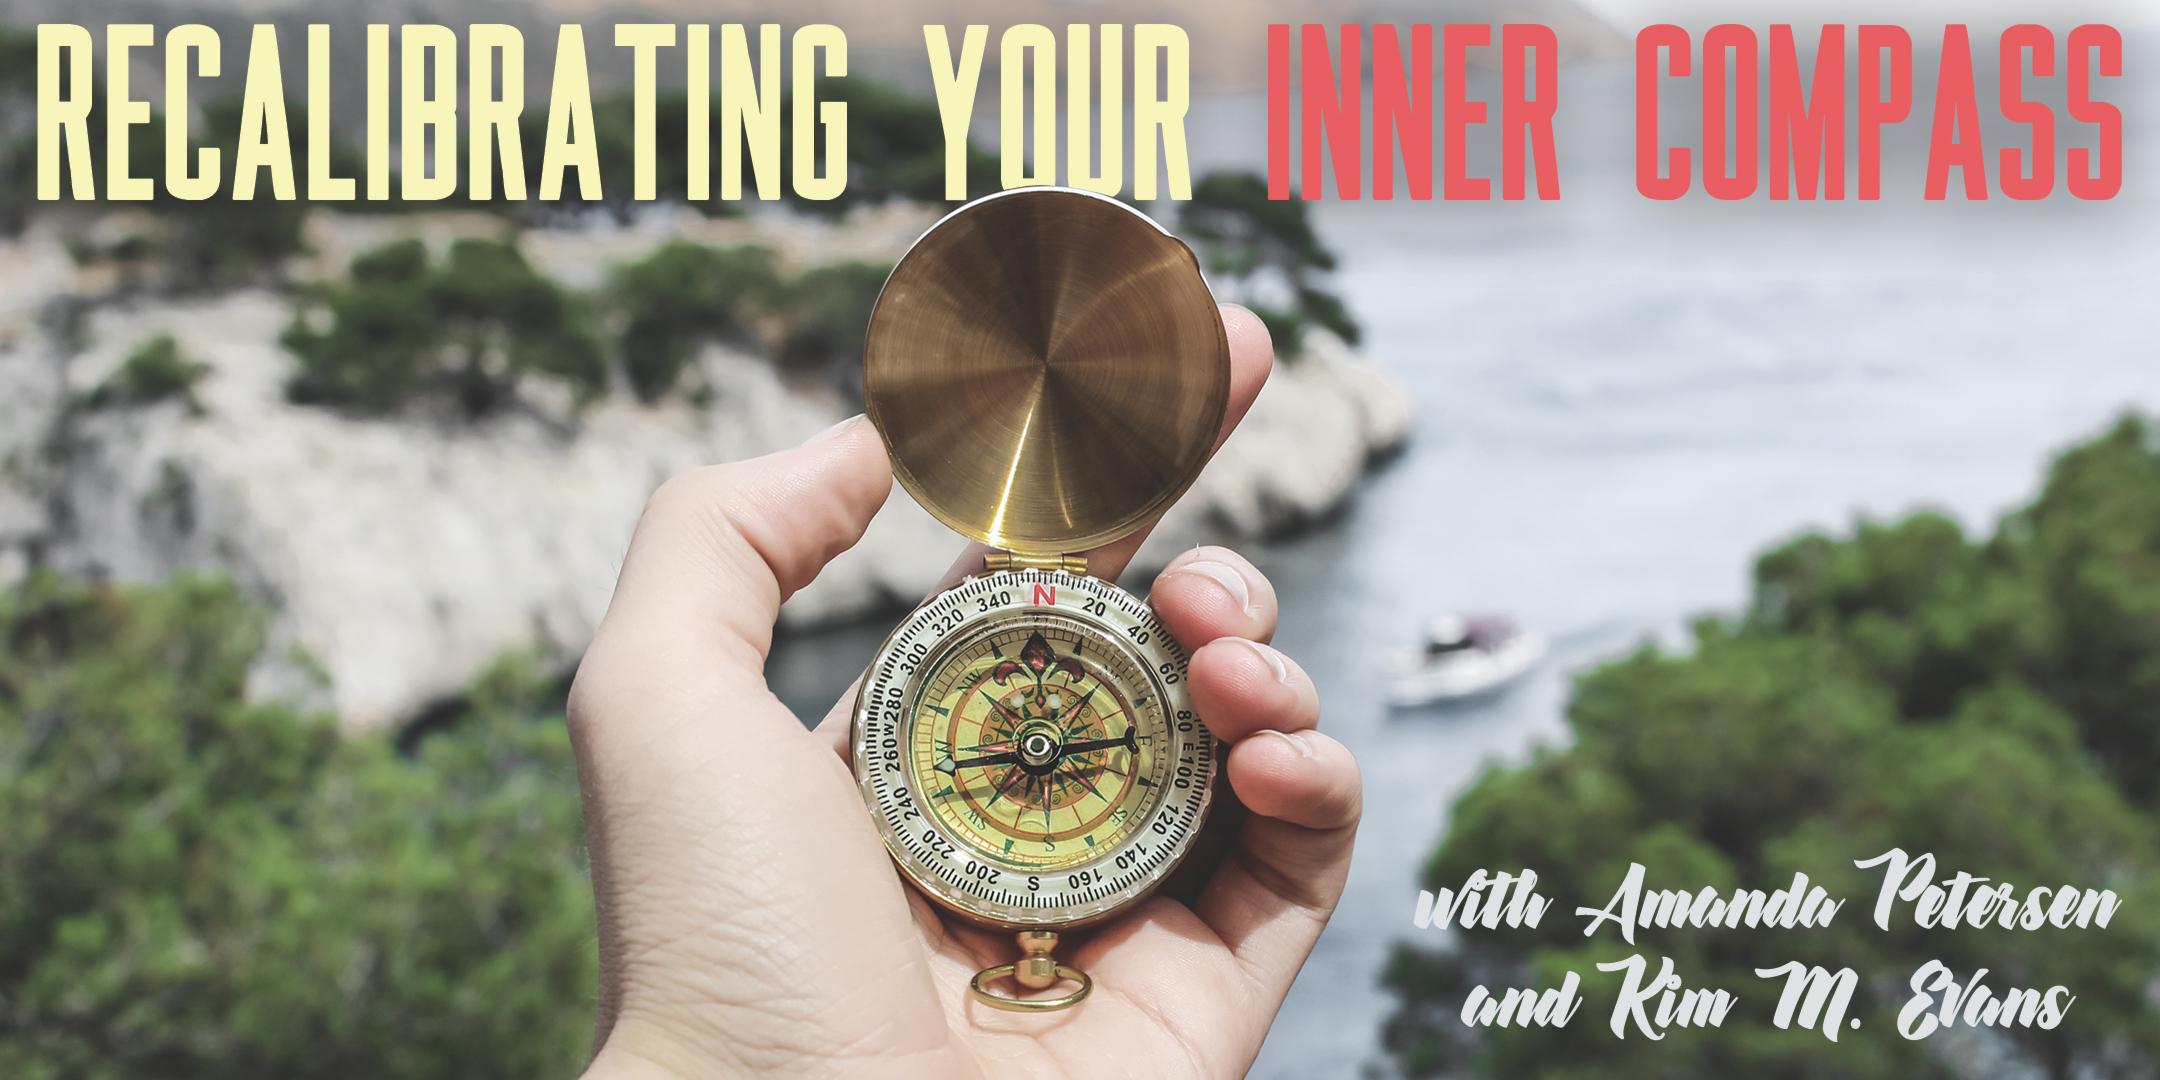 PoG_Eventbrite_Amanda_Kim_Recalibrating-Your-Inner-Compass.jpg